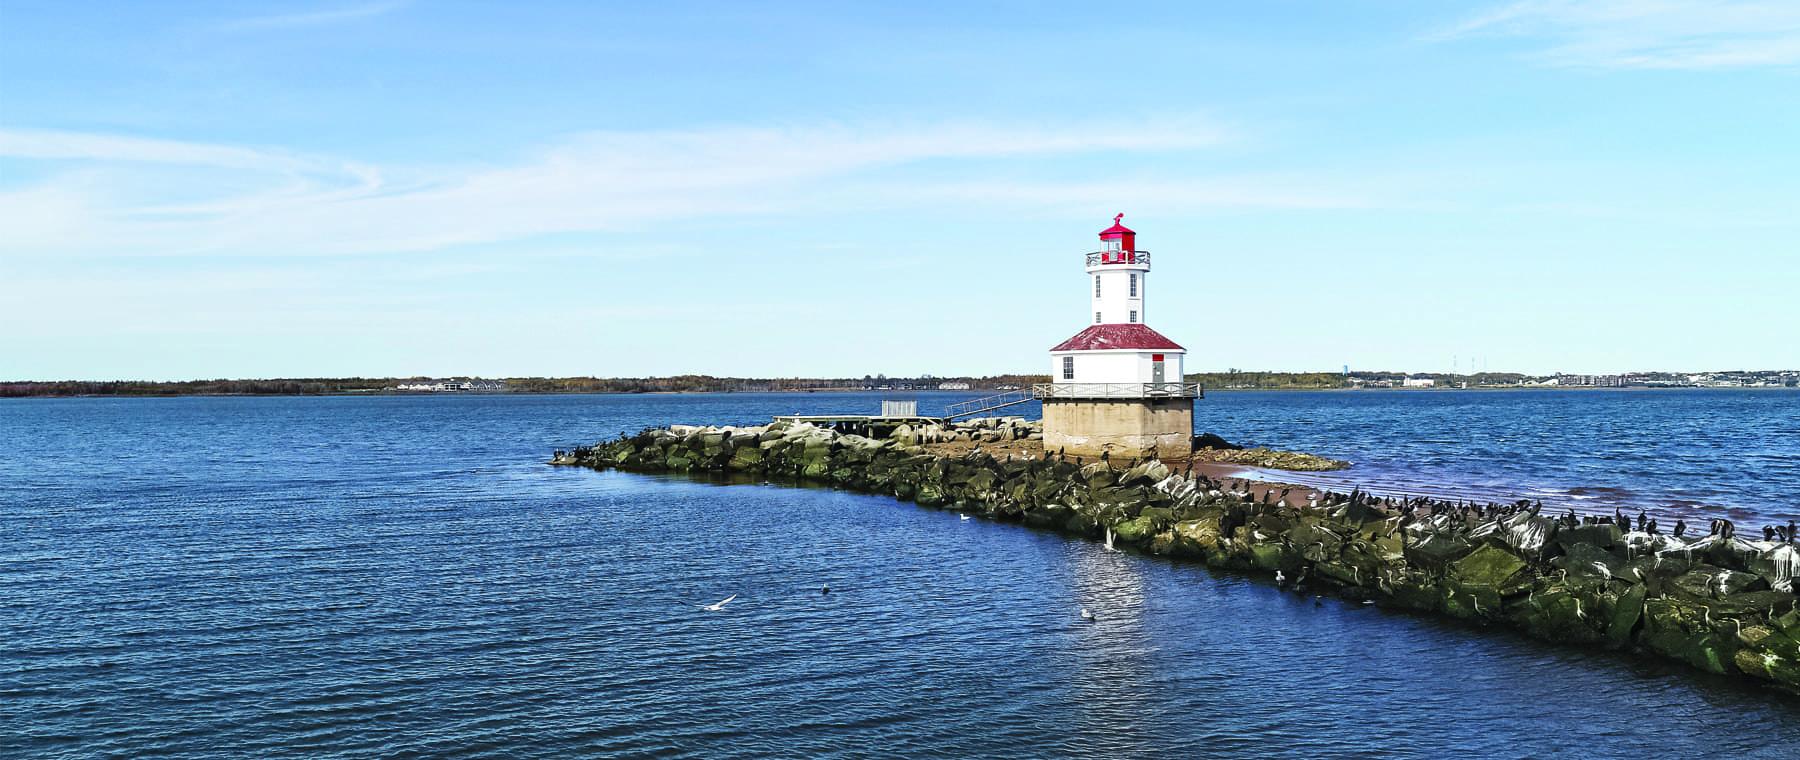 Lighthouse by Ocean